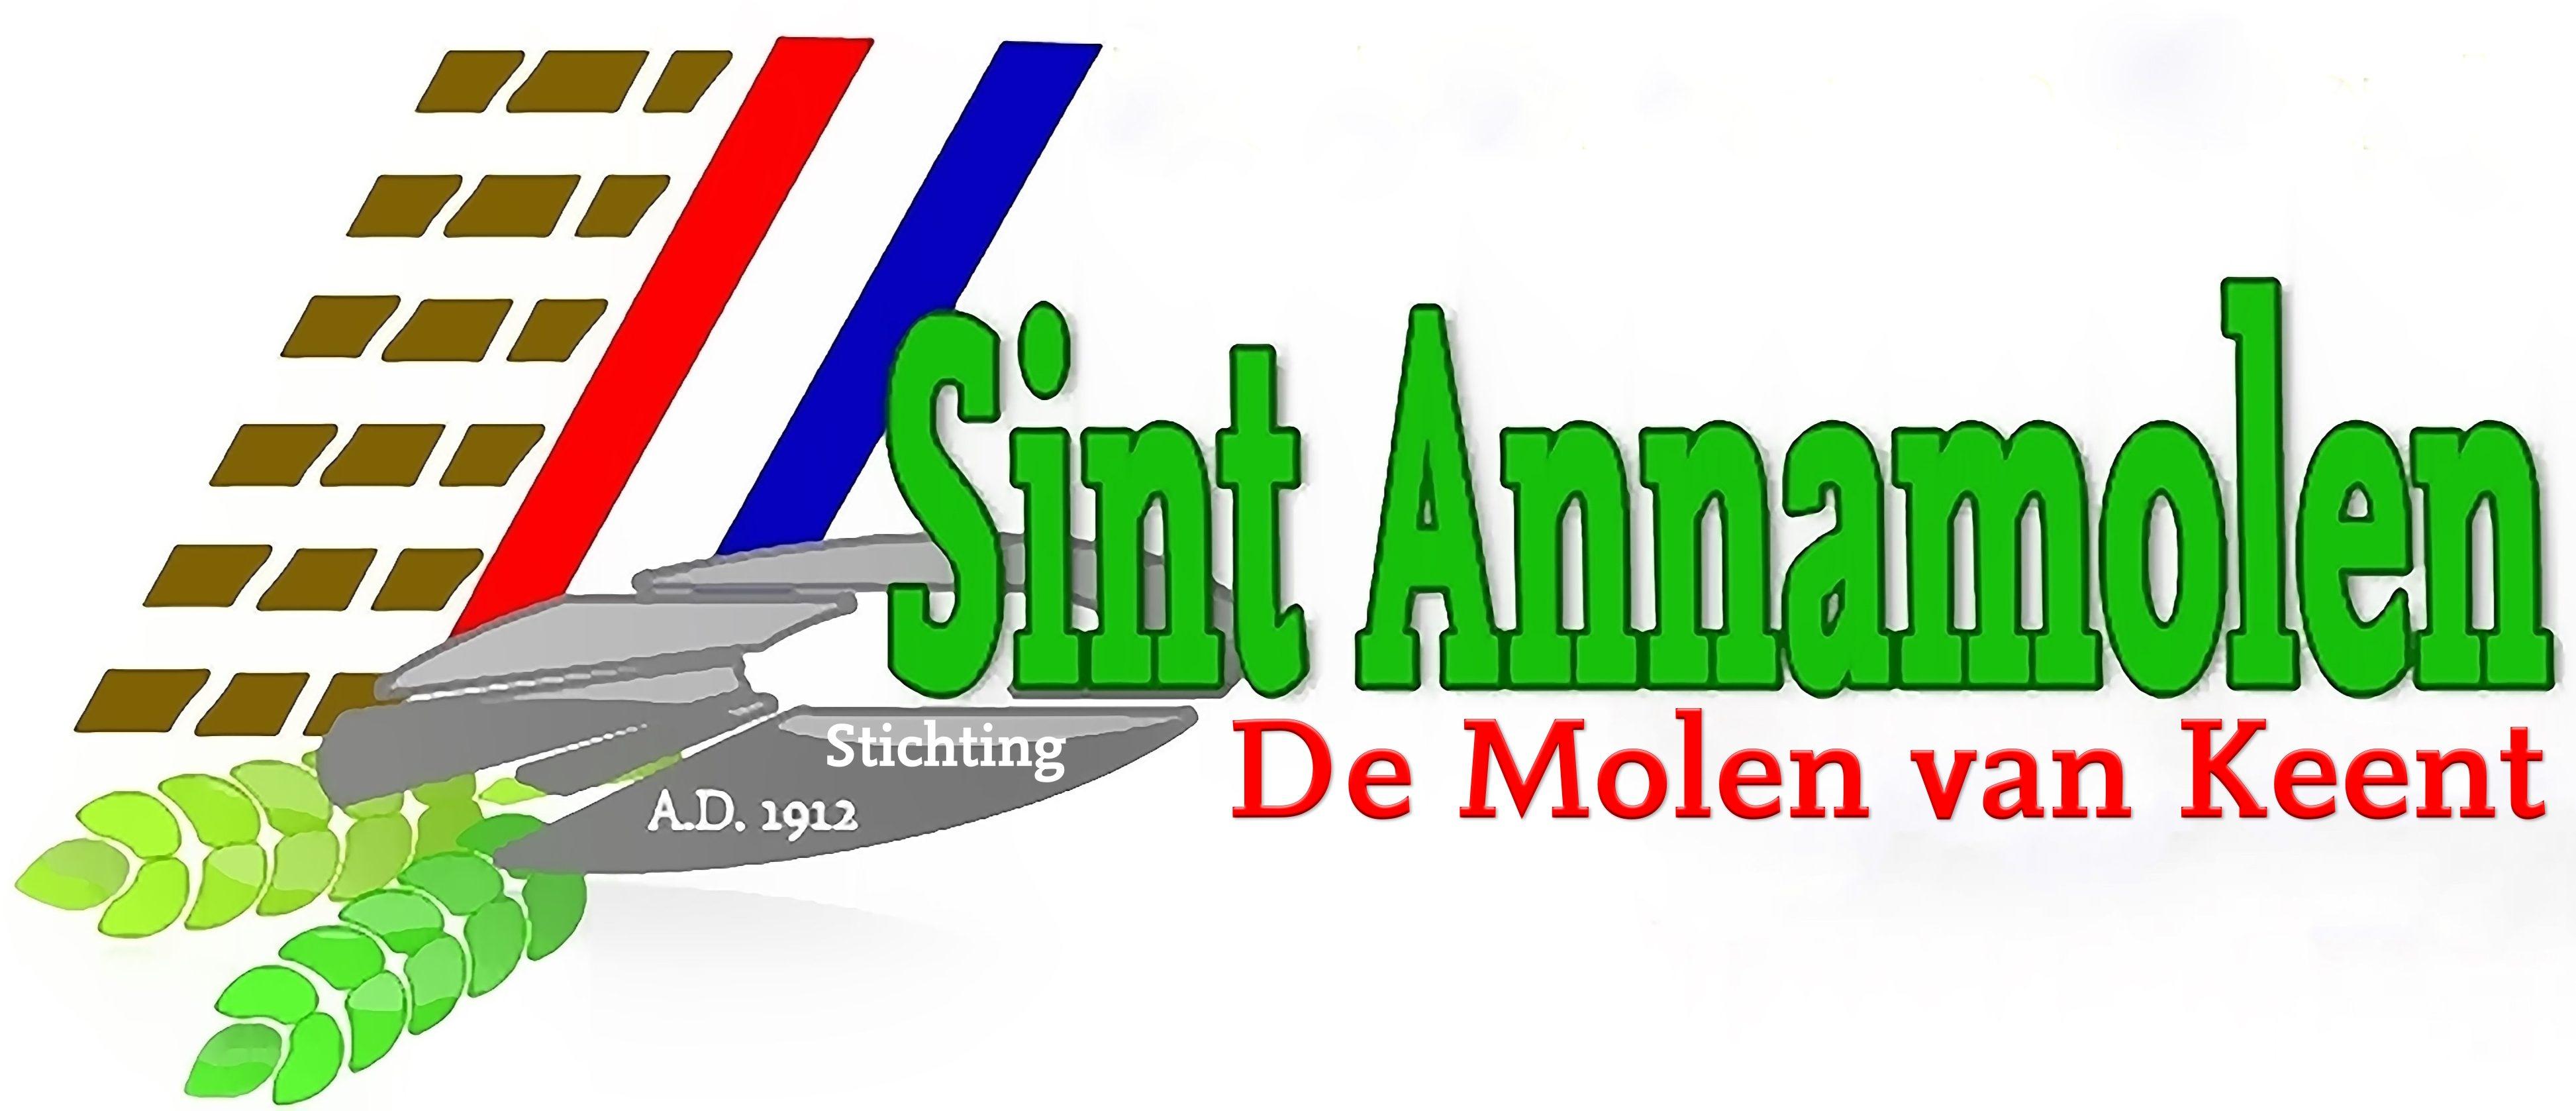 Sint Anna, de Molen van Keent